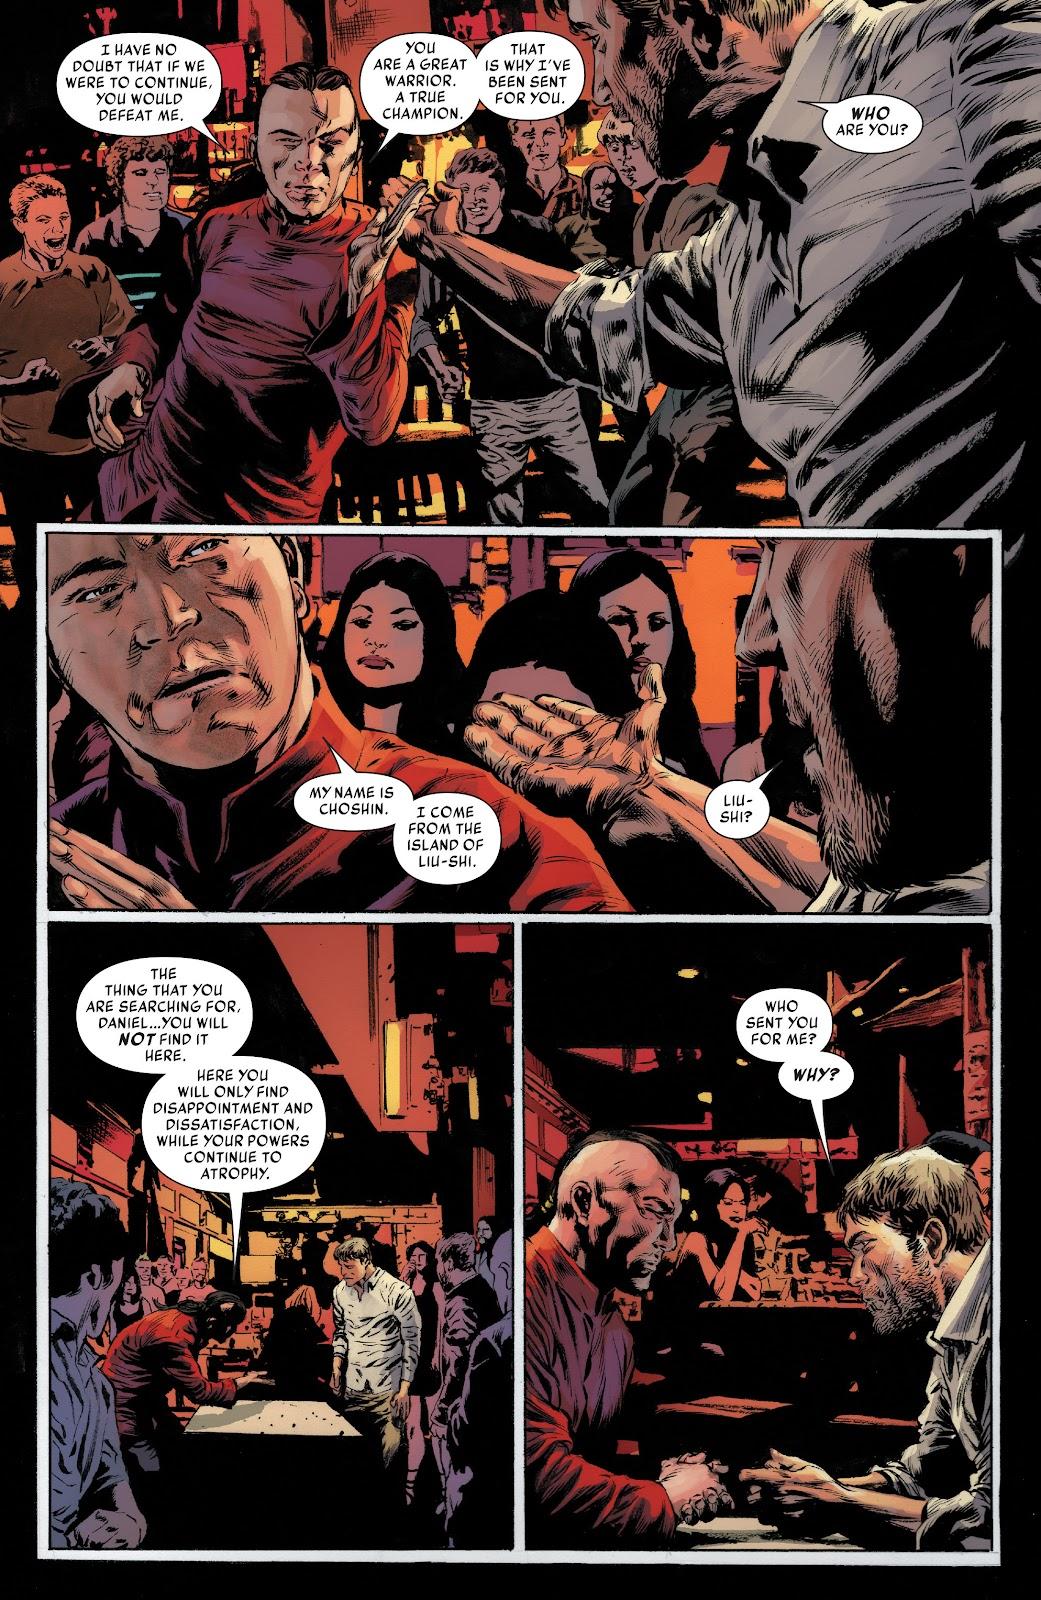 Iron Fist (2017) Issue #1 #1 - English 20